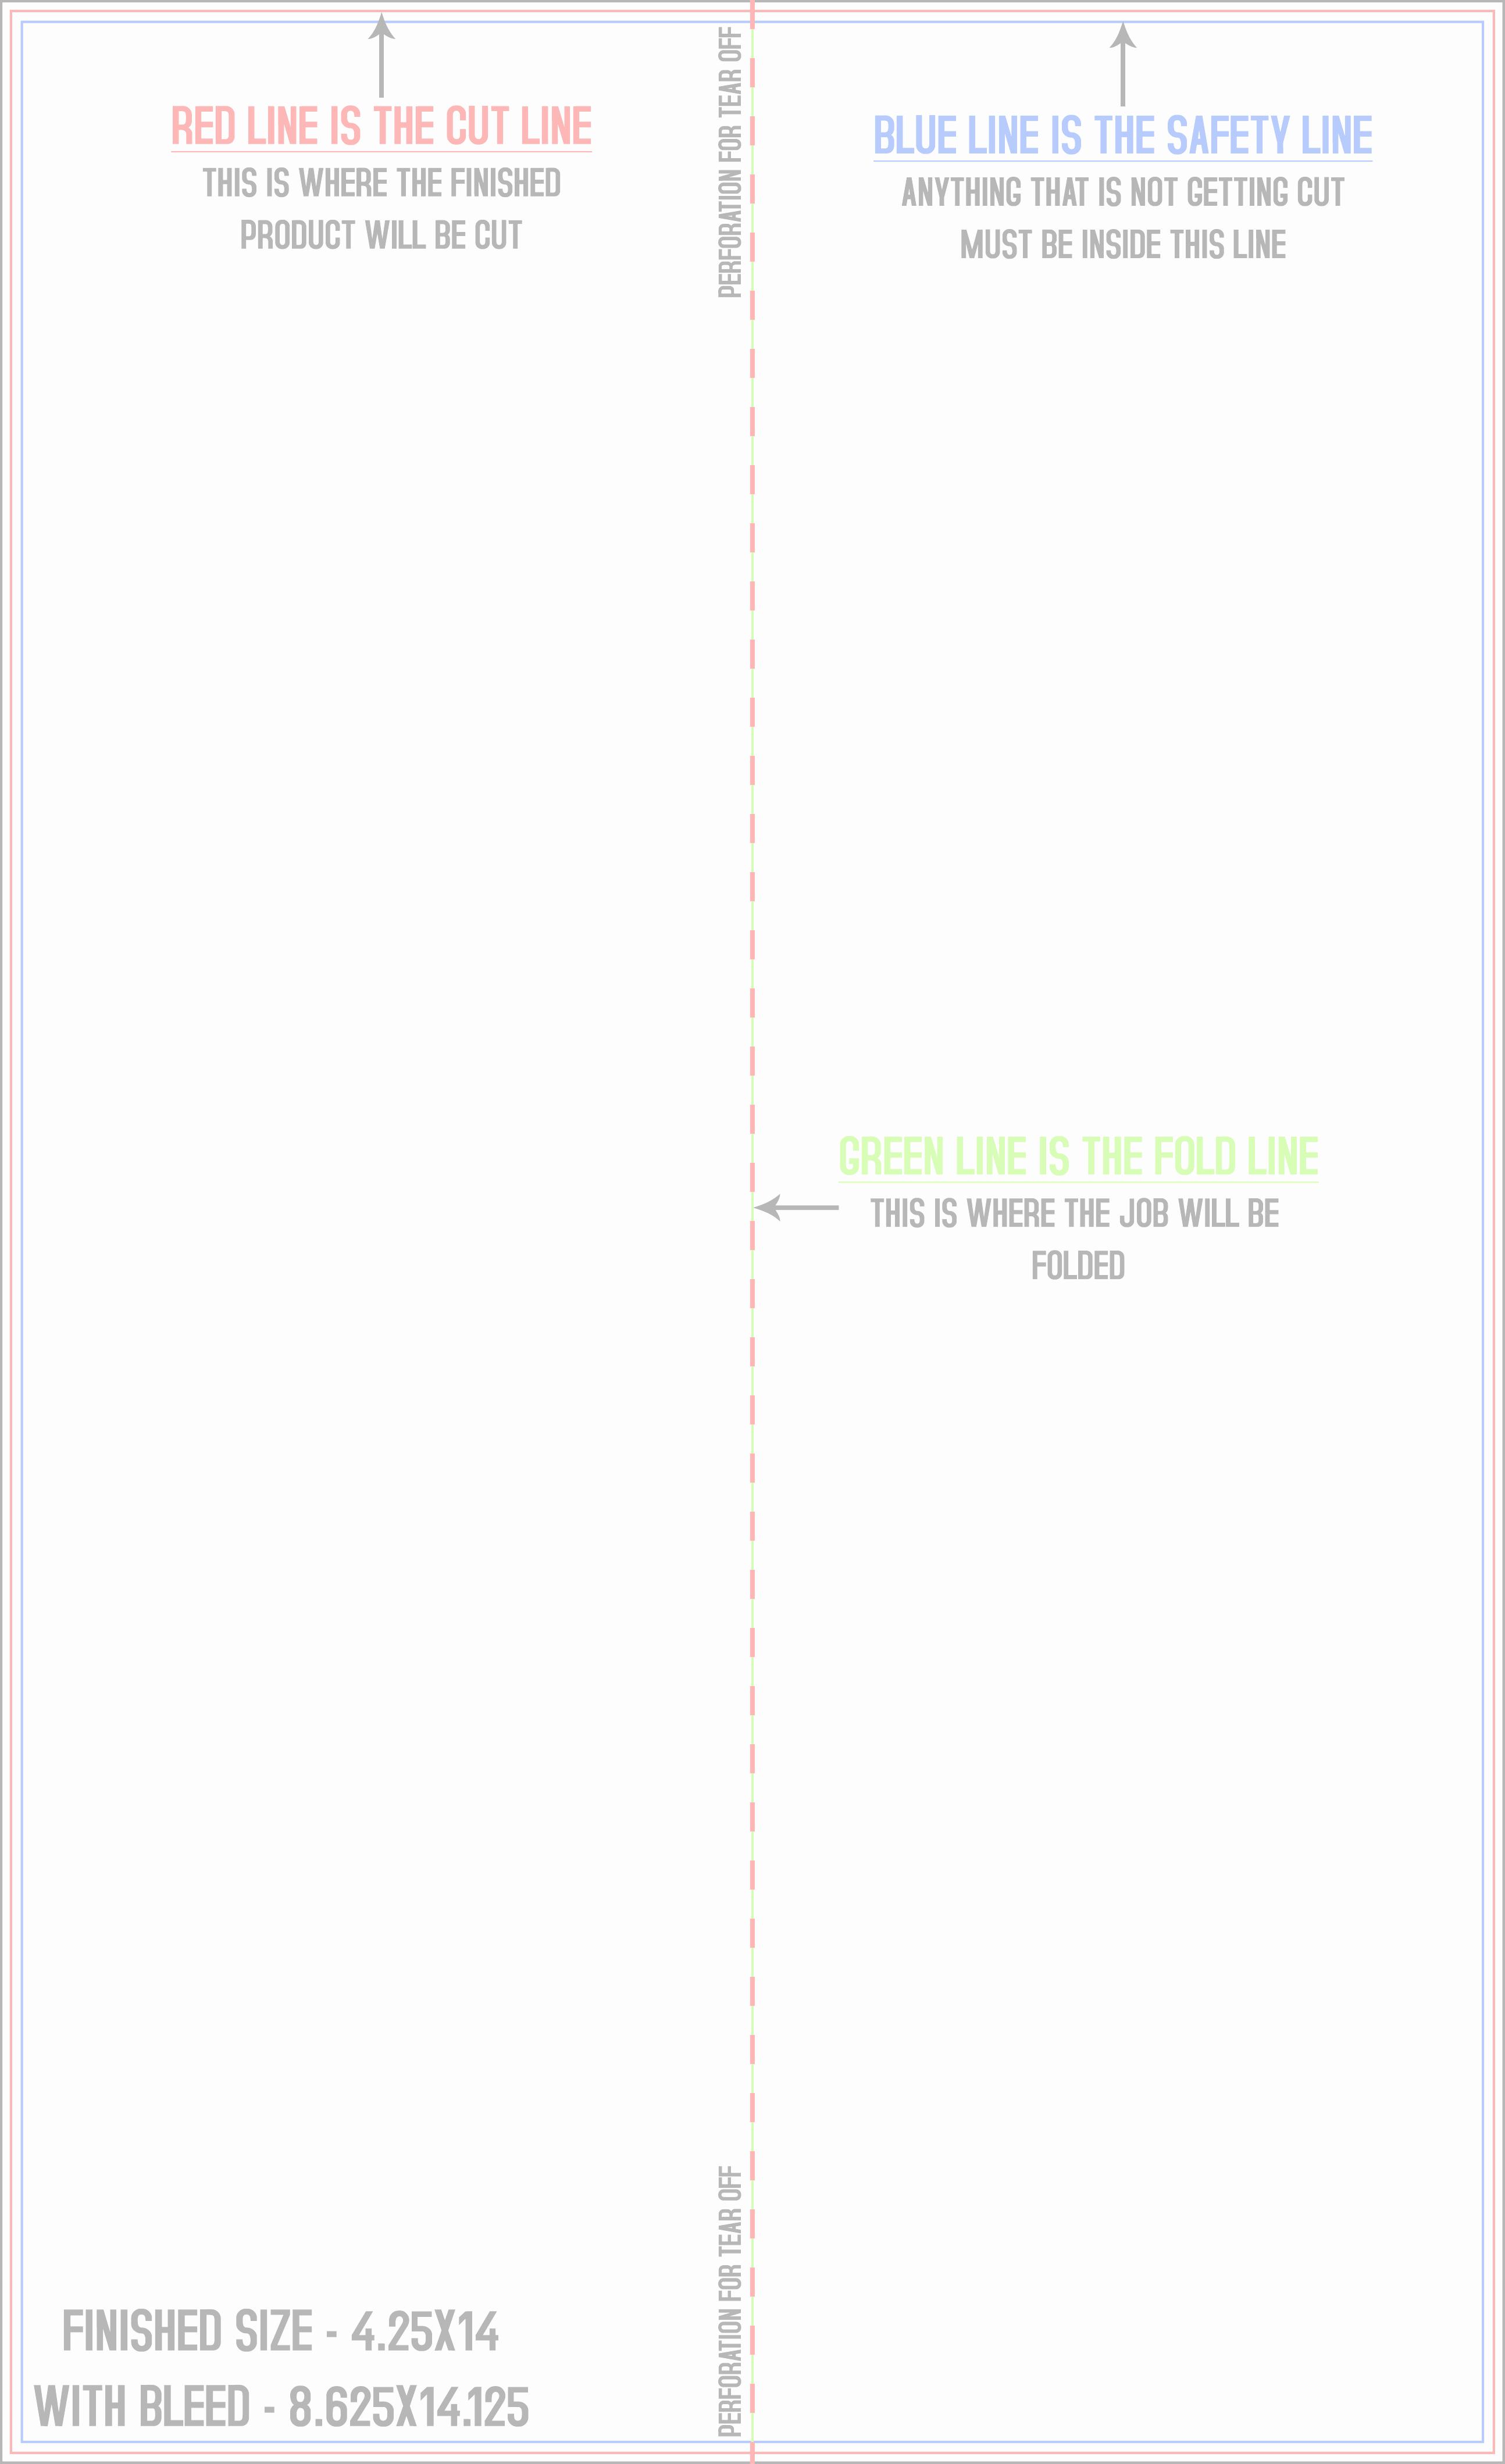 Half Fold Brochure Template Beautiful Brochure Half Fold & Perf On Fold Templates